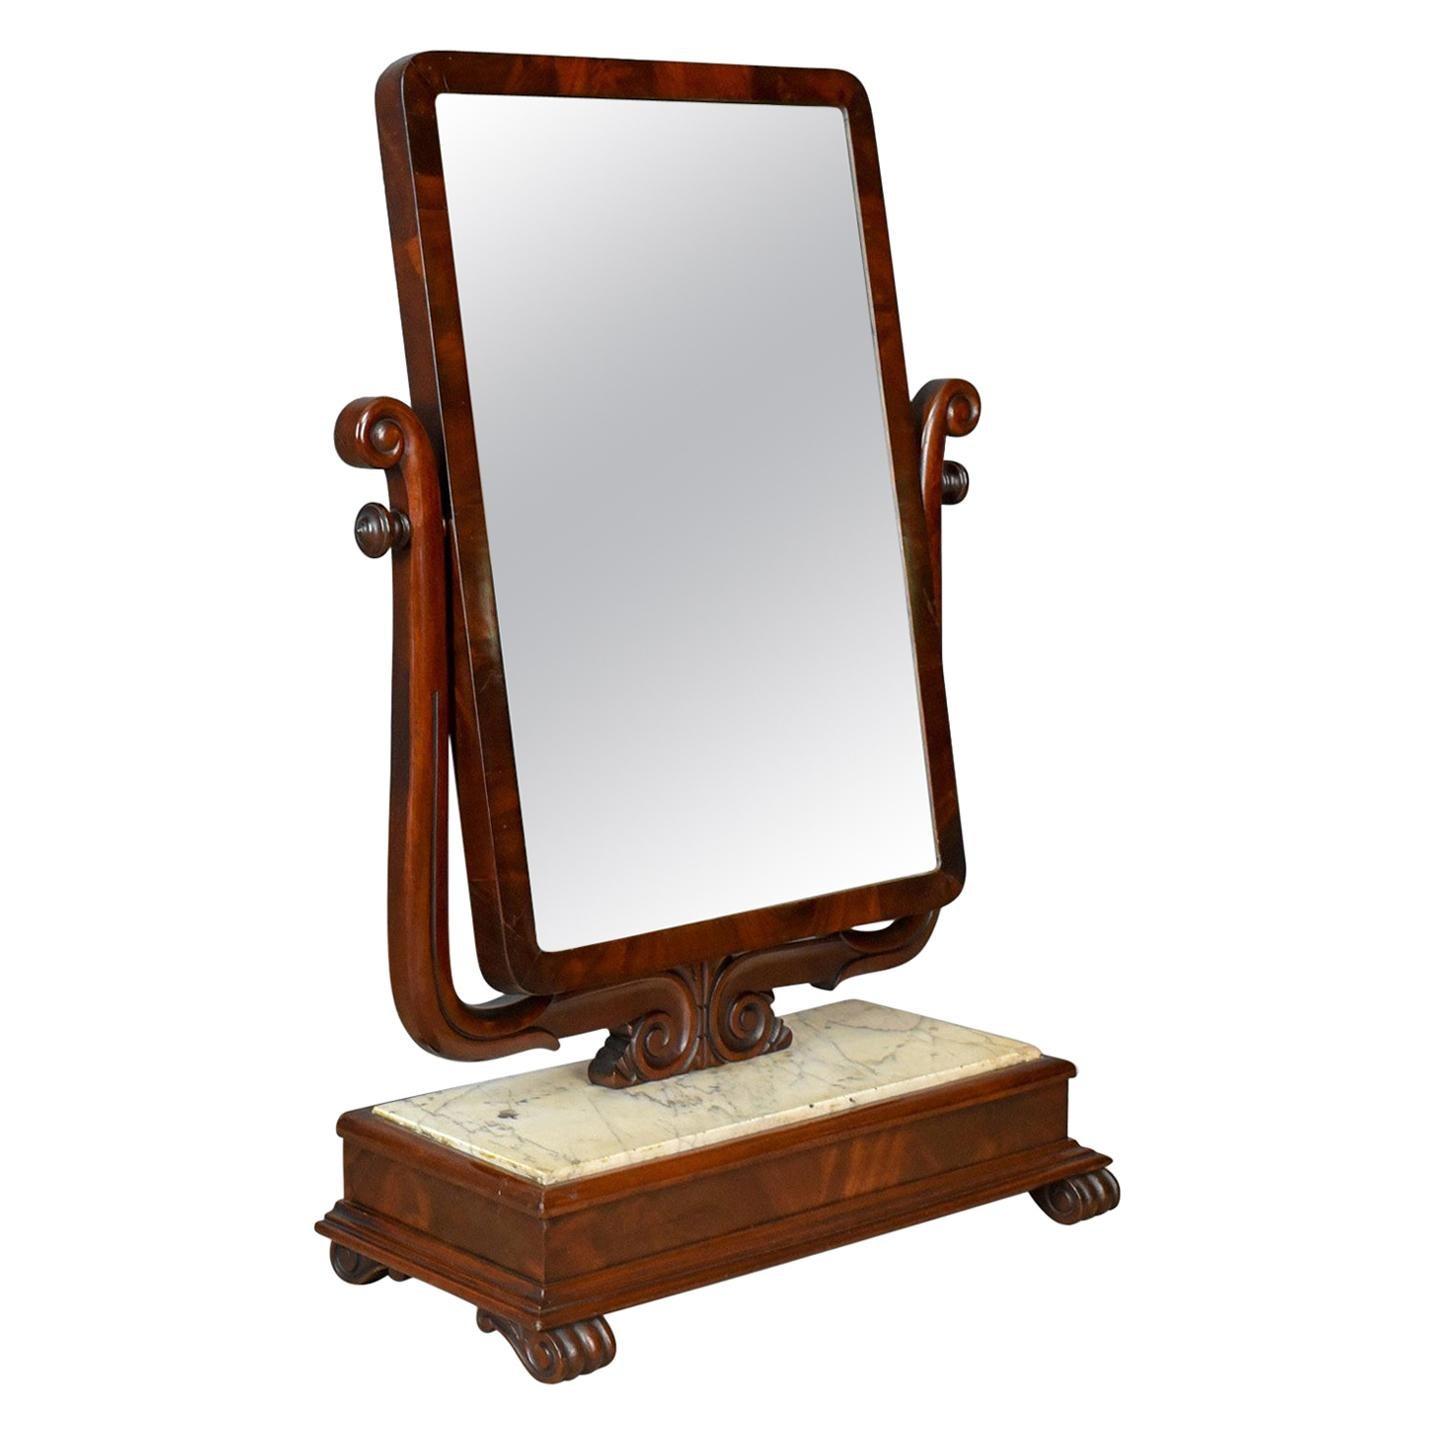 Large Antique Vanity Mirror, English, Victorian Marble, circa 1850